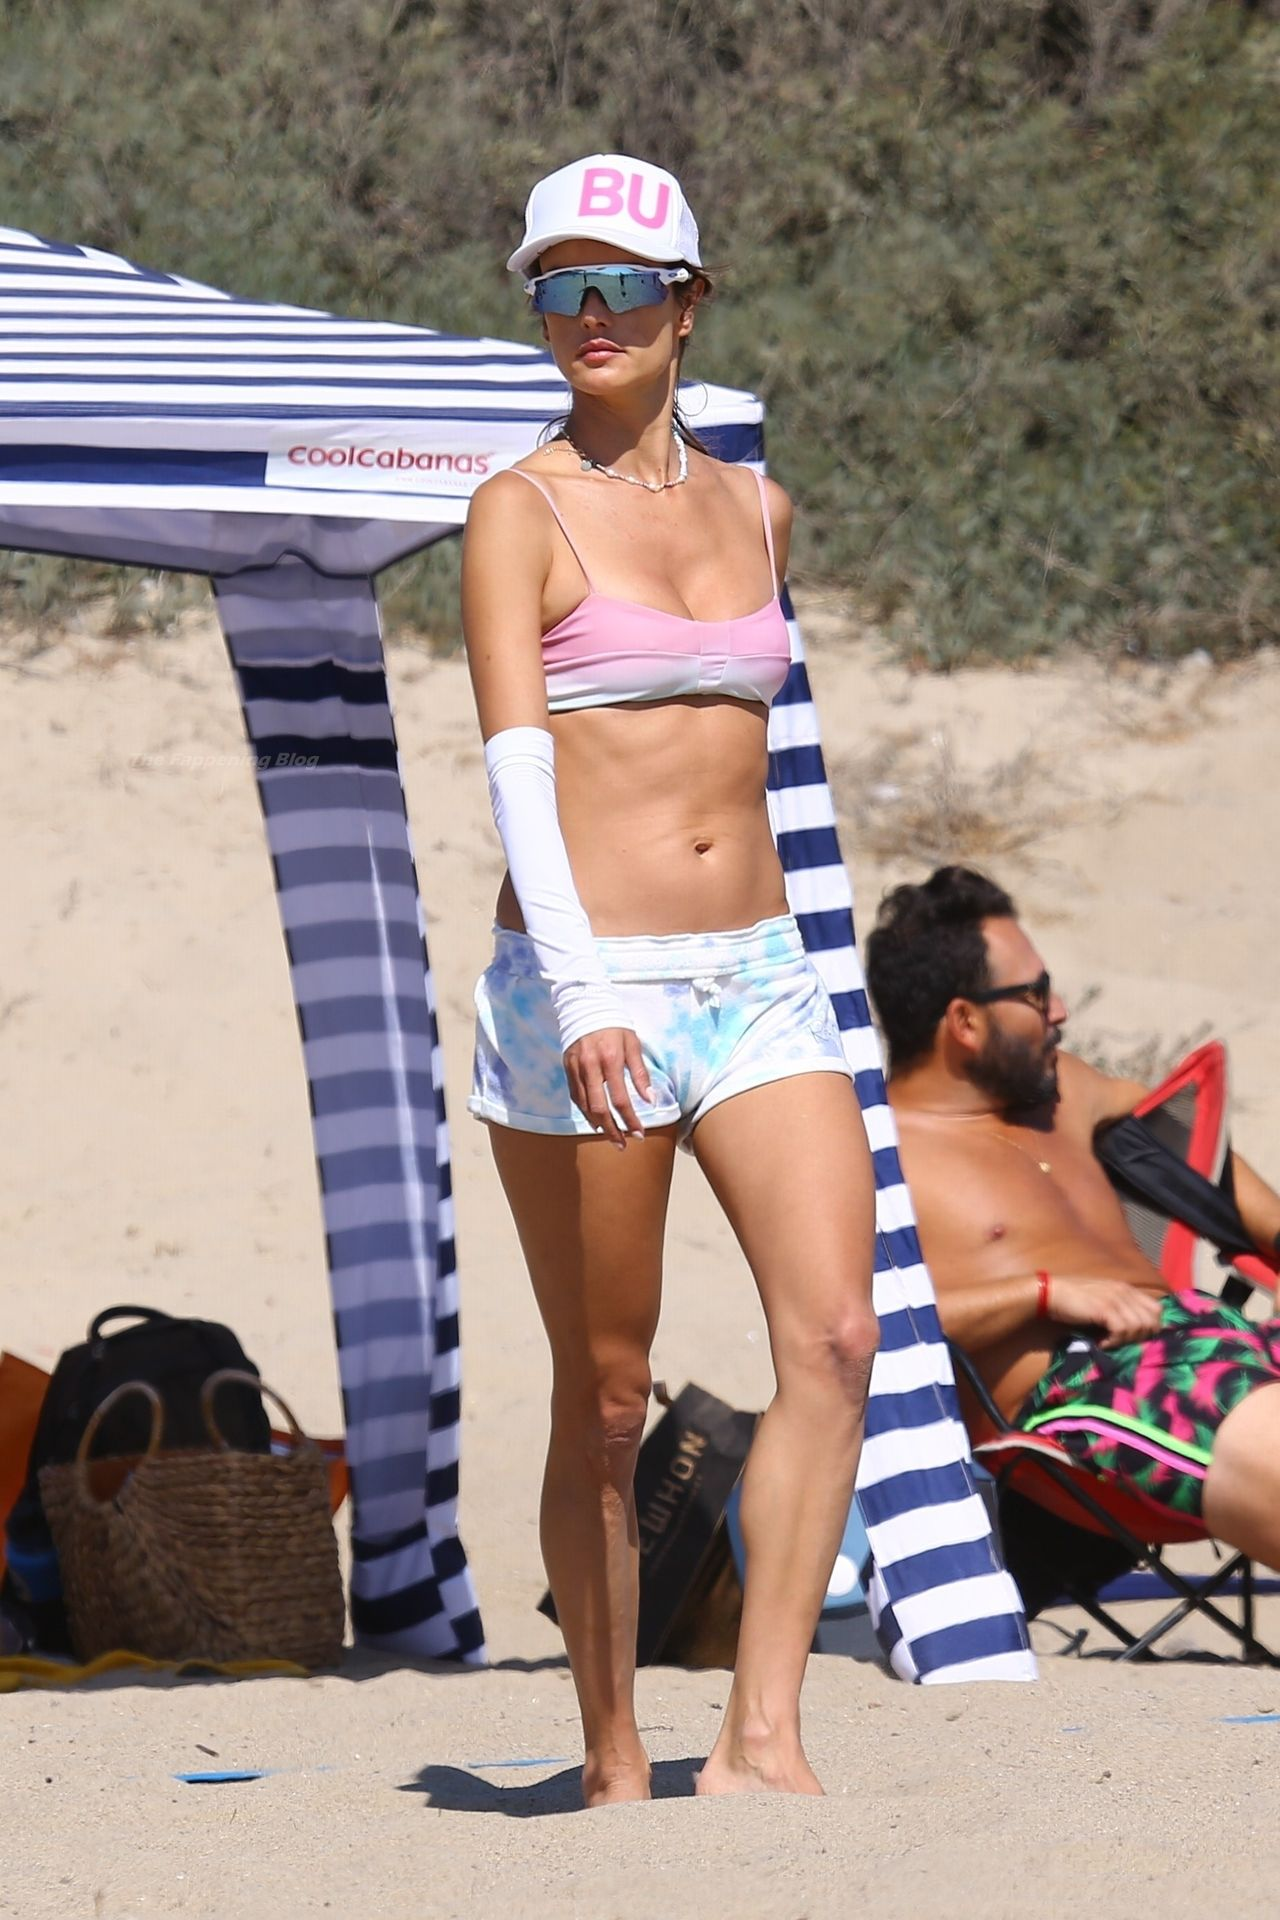 Alessandra-Ambrosio-Sexy-The-Fappening-Blog-25-1.jpg